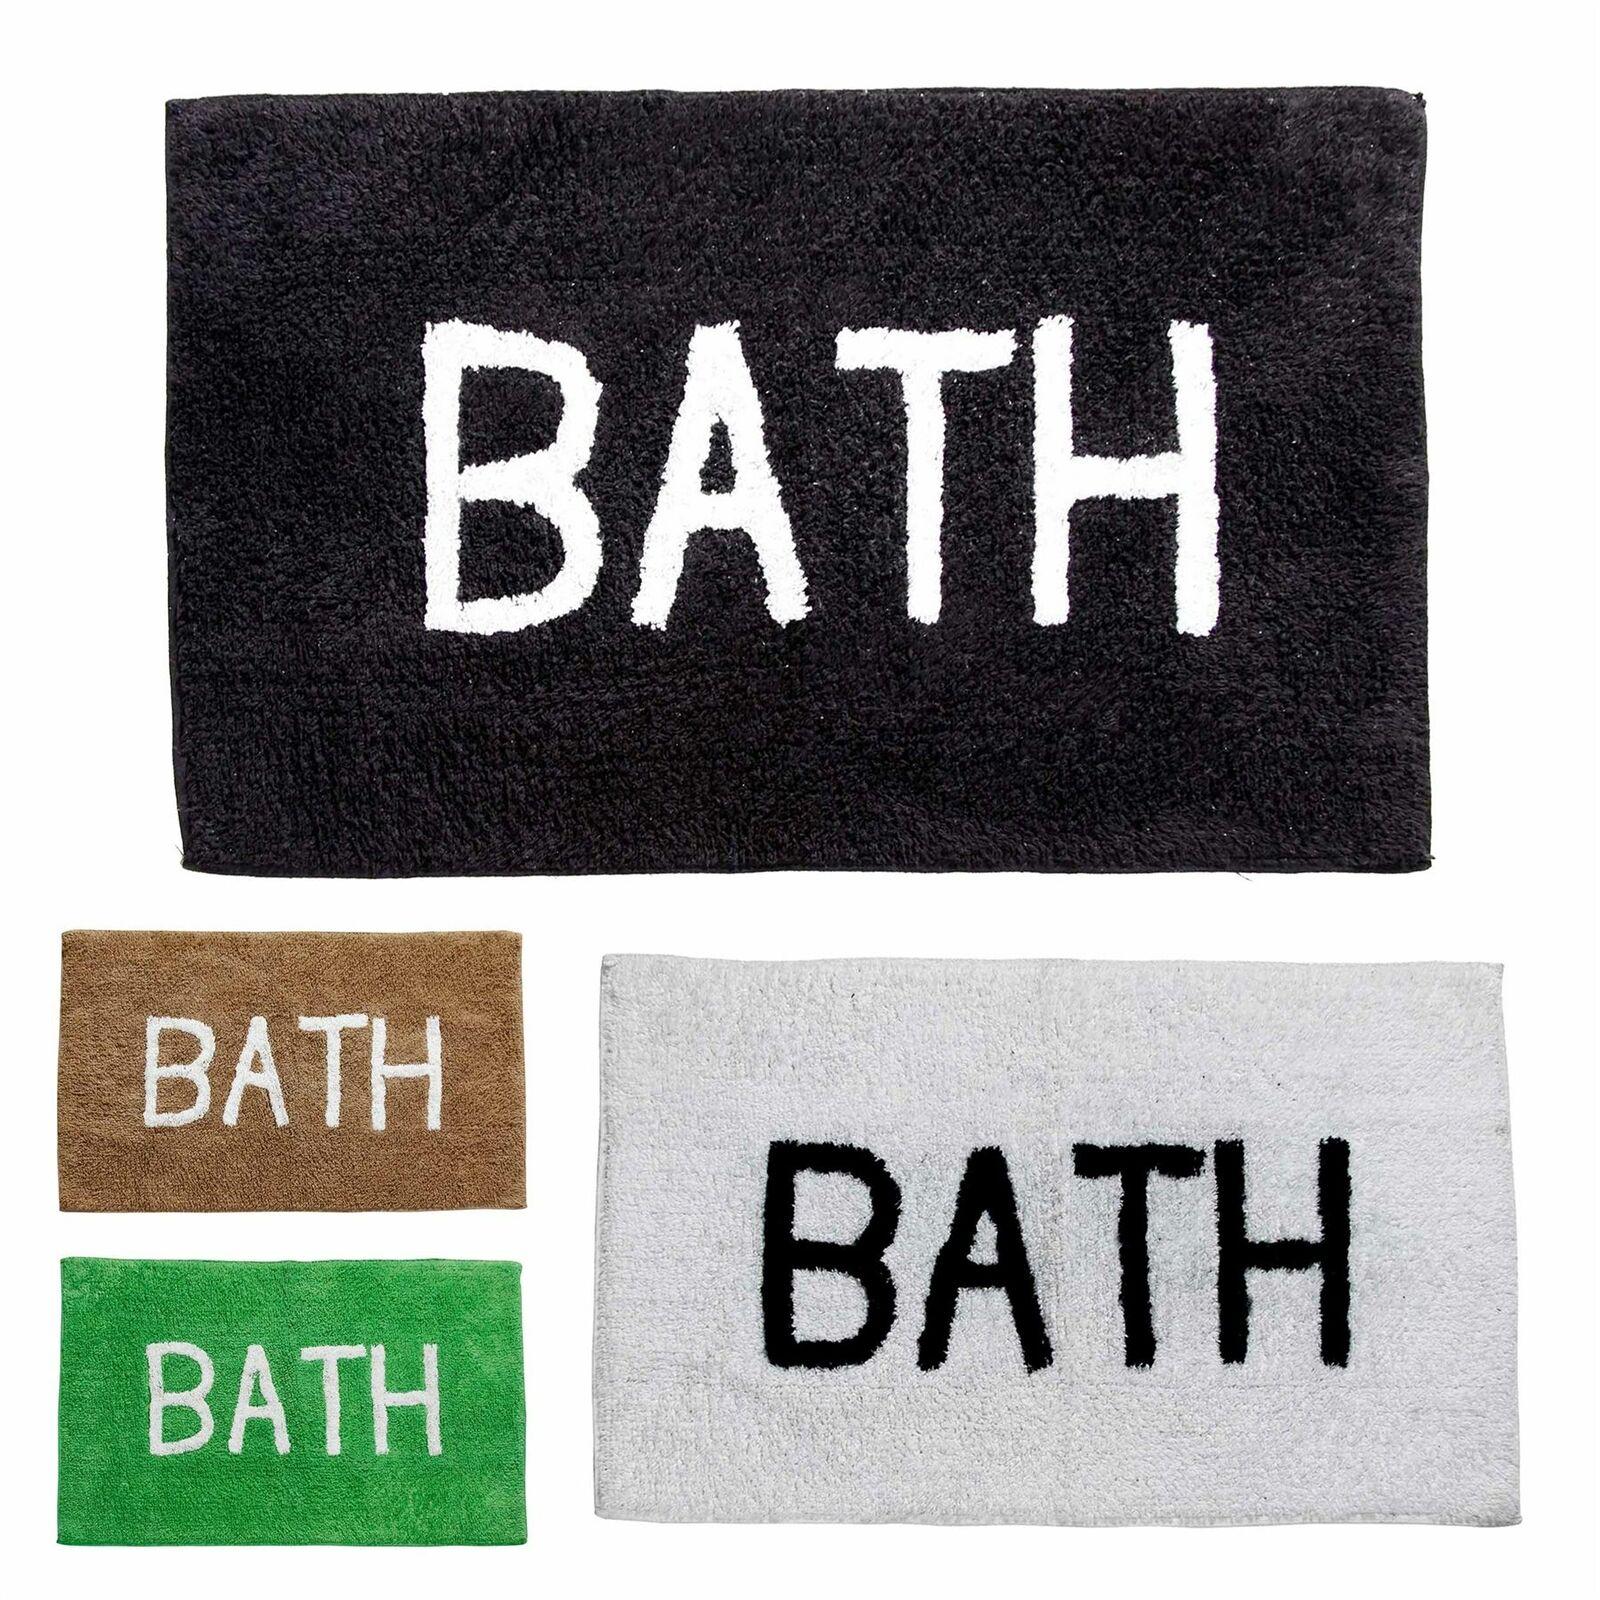 Bath Phrase Cotton Bath Mat Non Slip 1300 GSM Black, Green, White, Brown